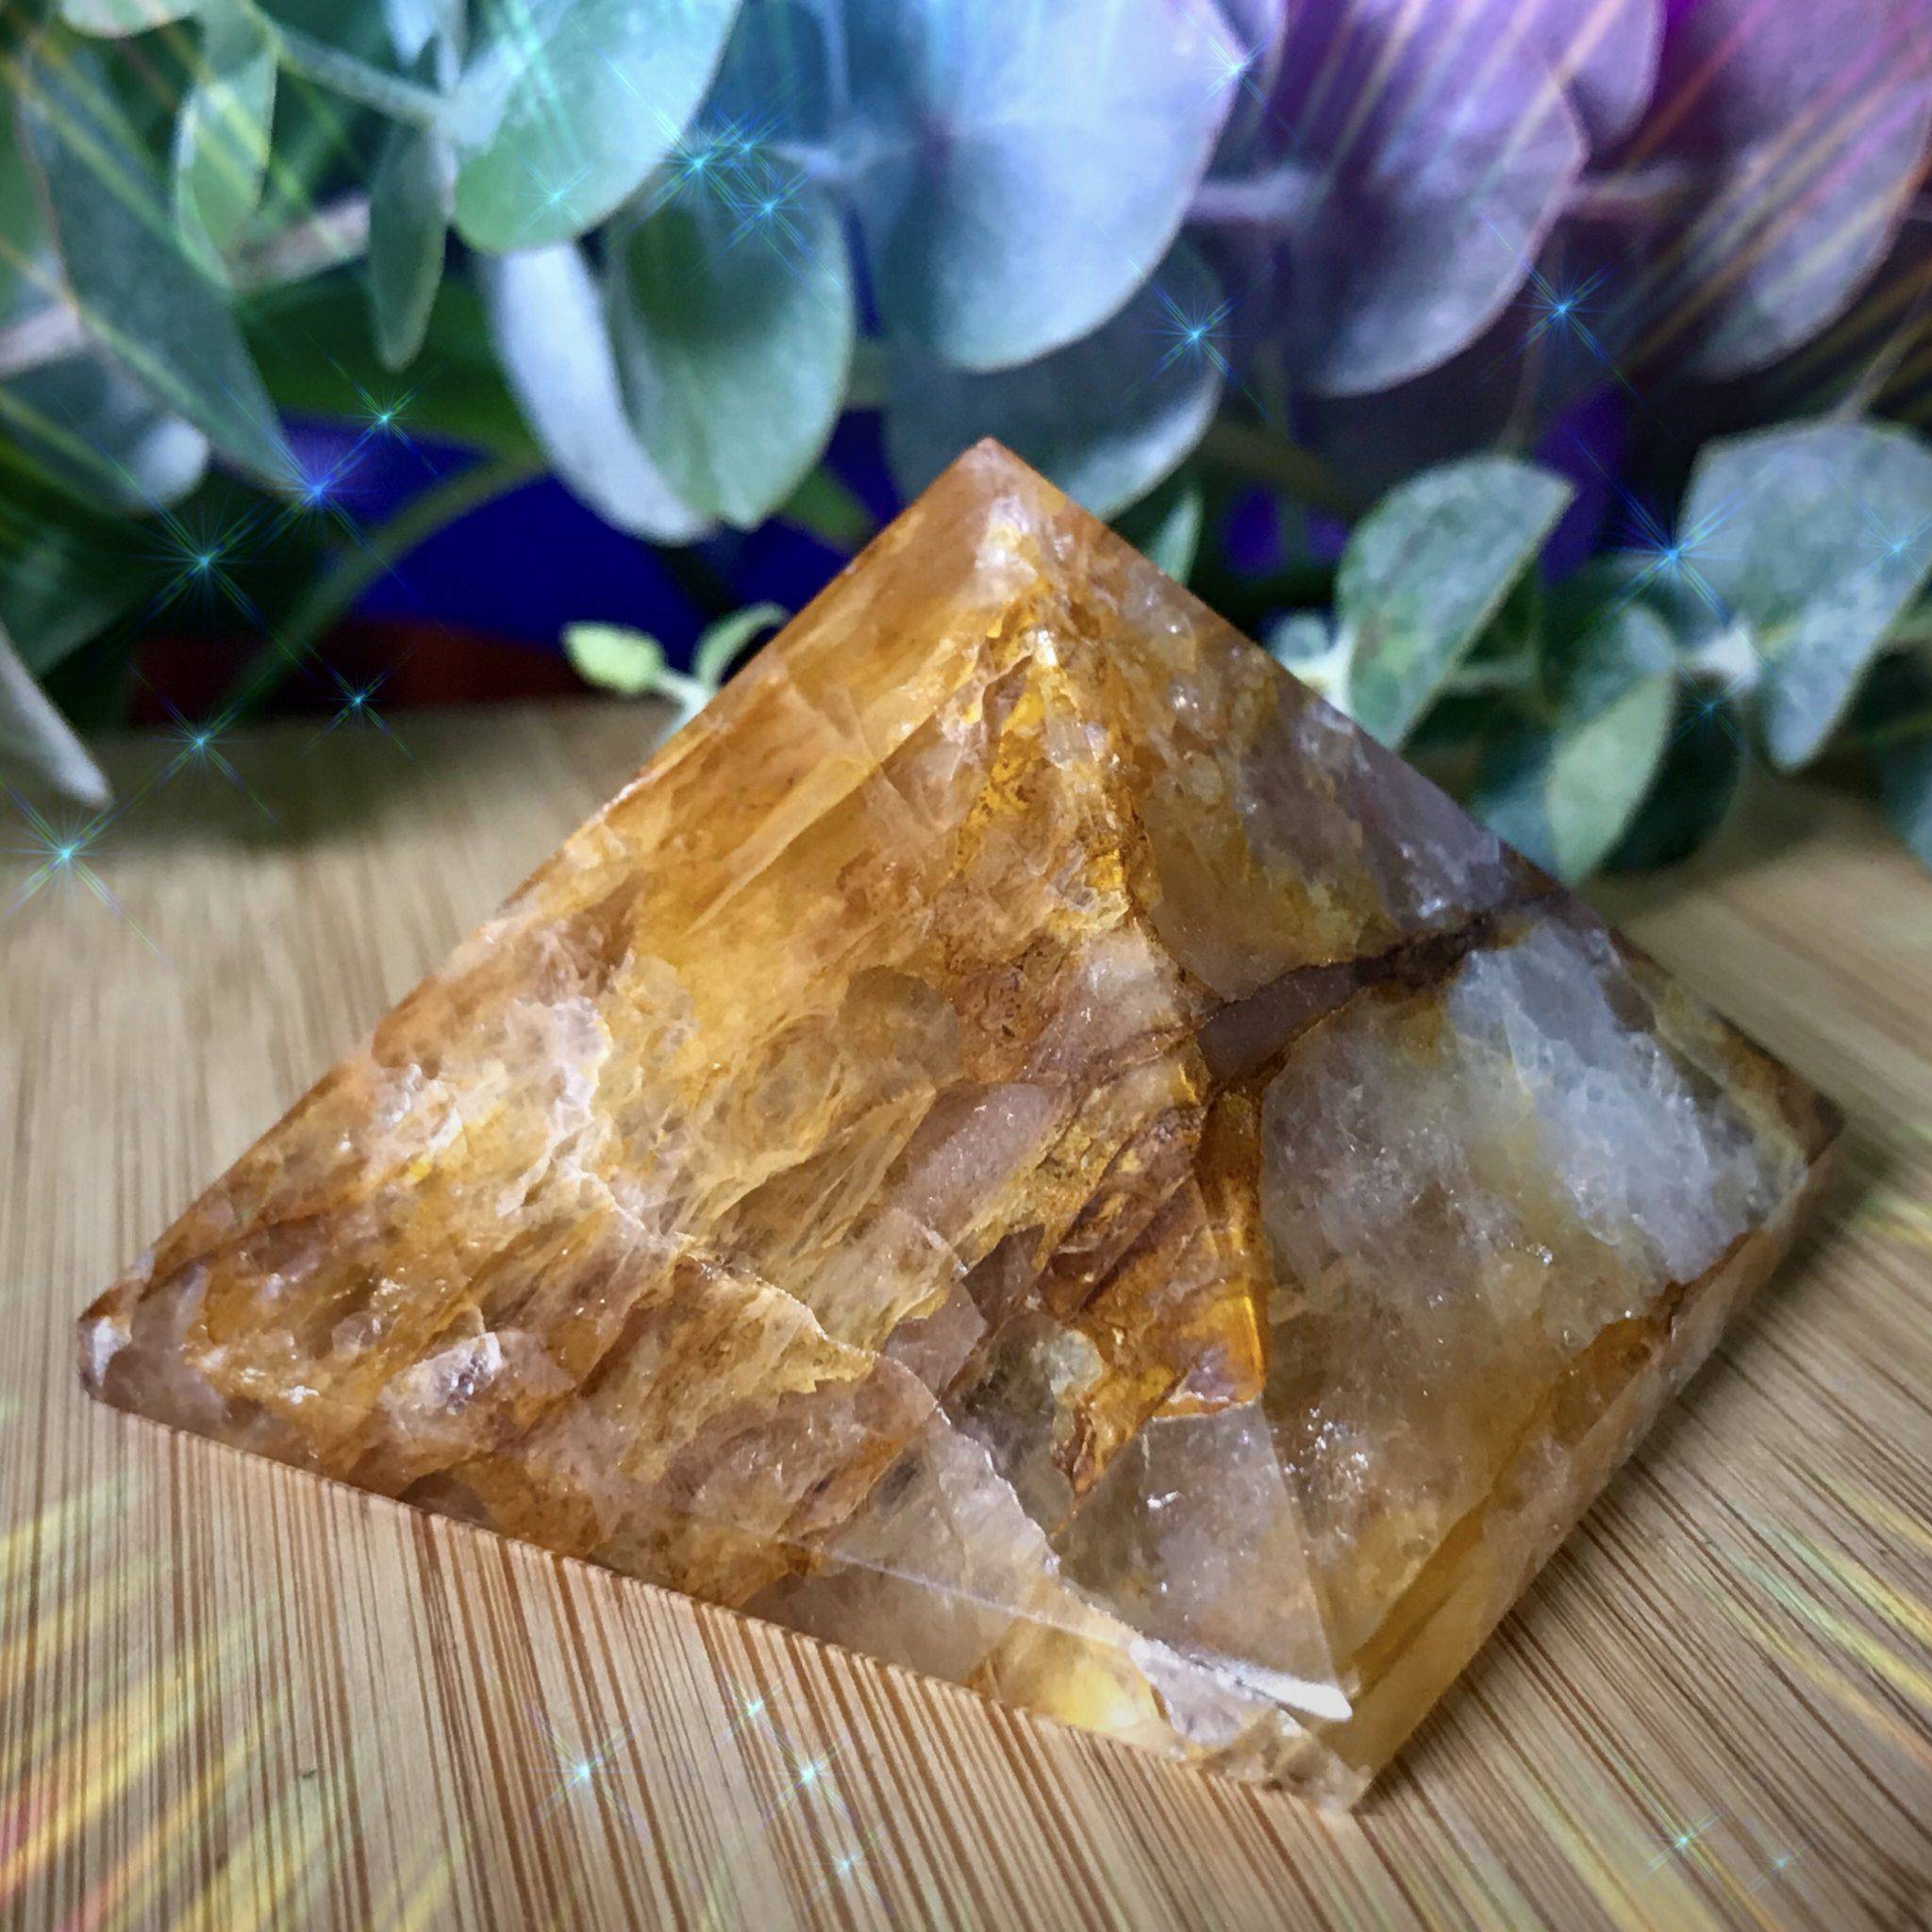 Lemurian Golden Healer Pyramids for love and higher consciousness